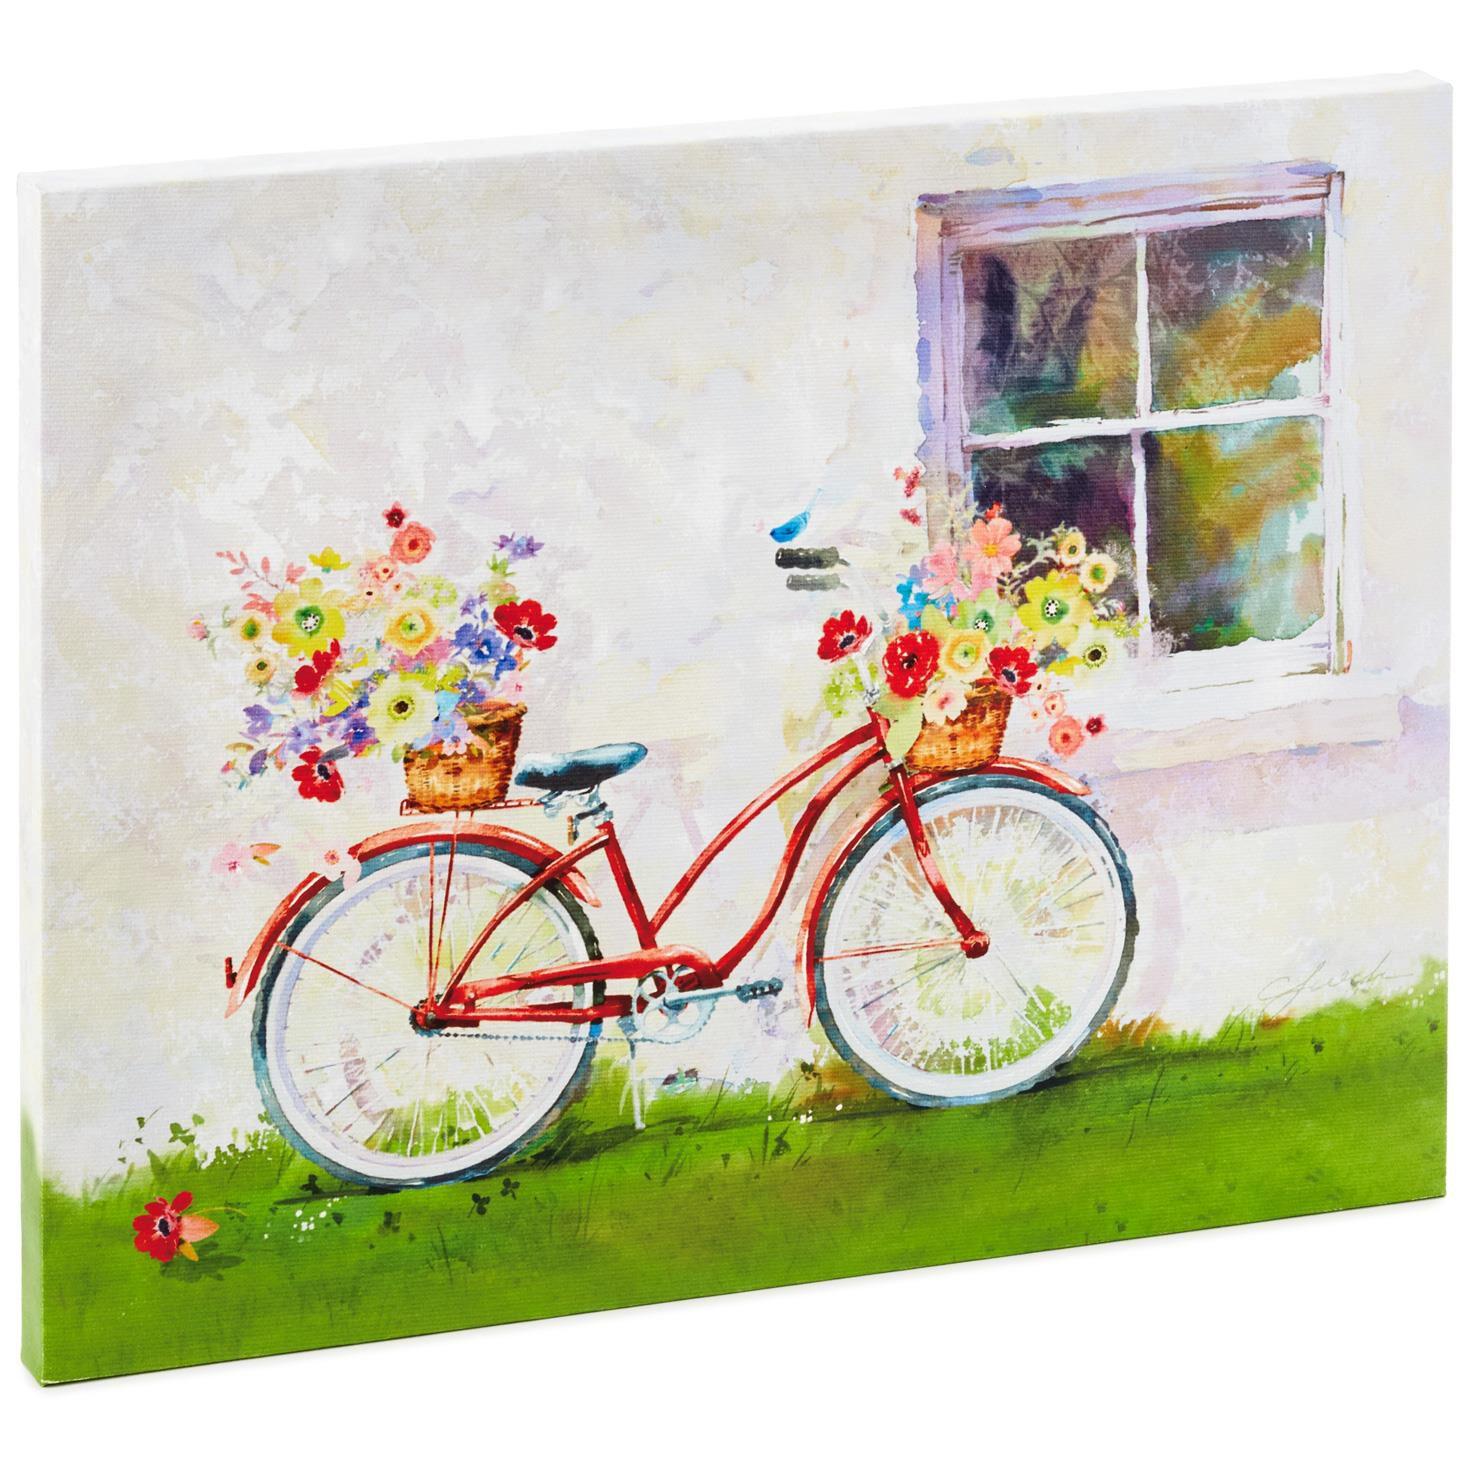 Bicycle Canvas Art, 11x14 - Framed Art & Prints - Hallmark